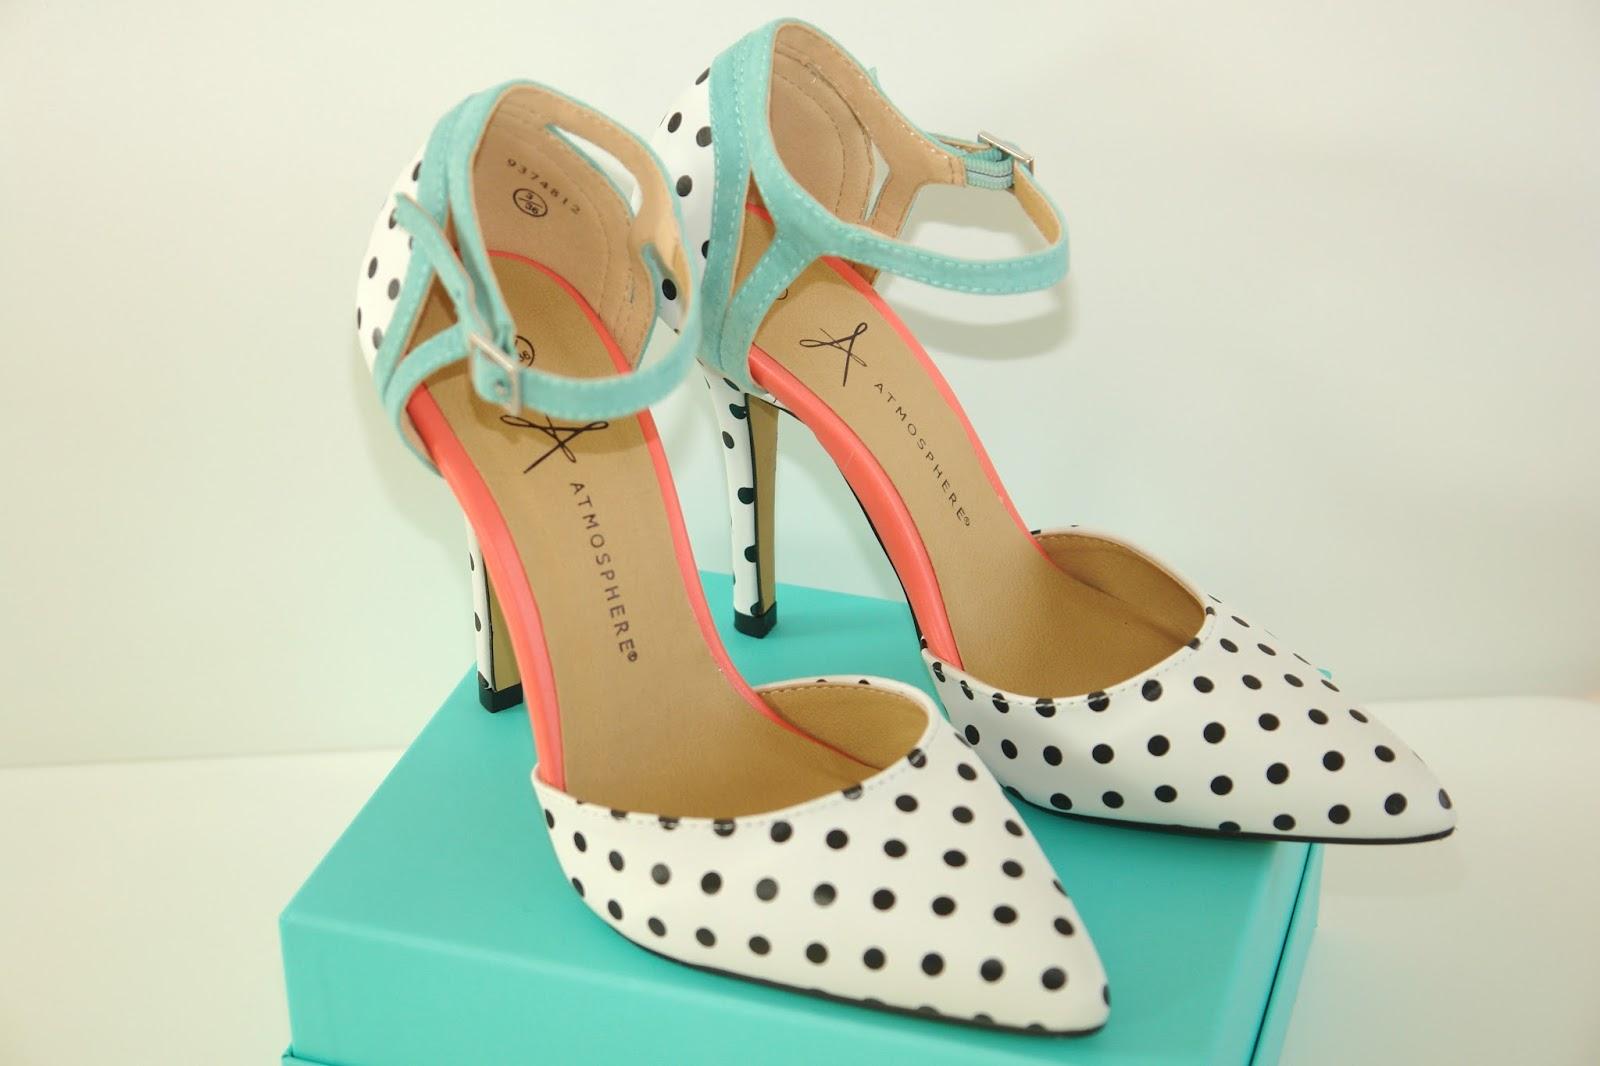 New perfect Primark heels for summer, 2014, heel, minted, neon, Primark, shoes, polka-dots, cute shoes, heels